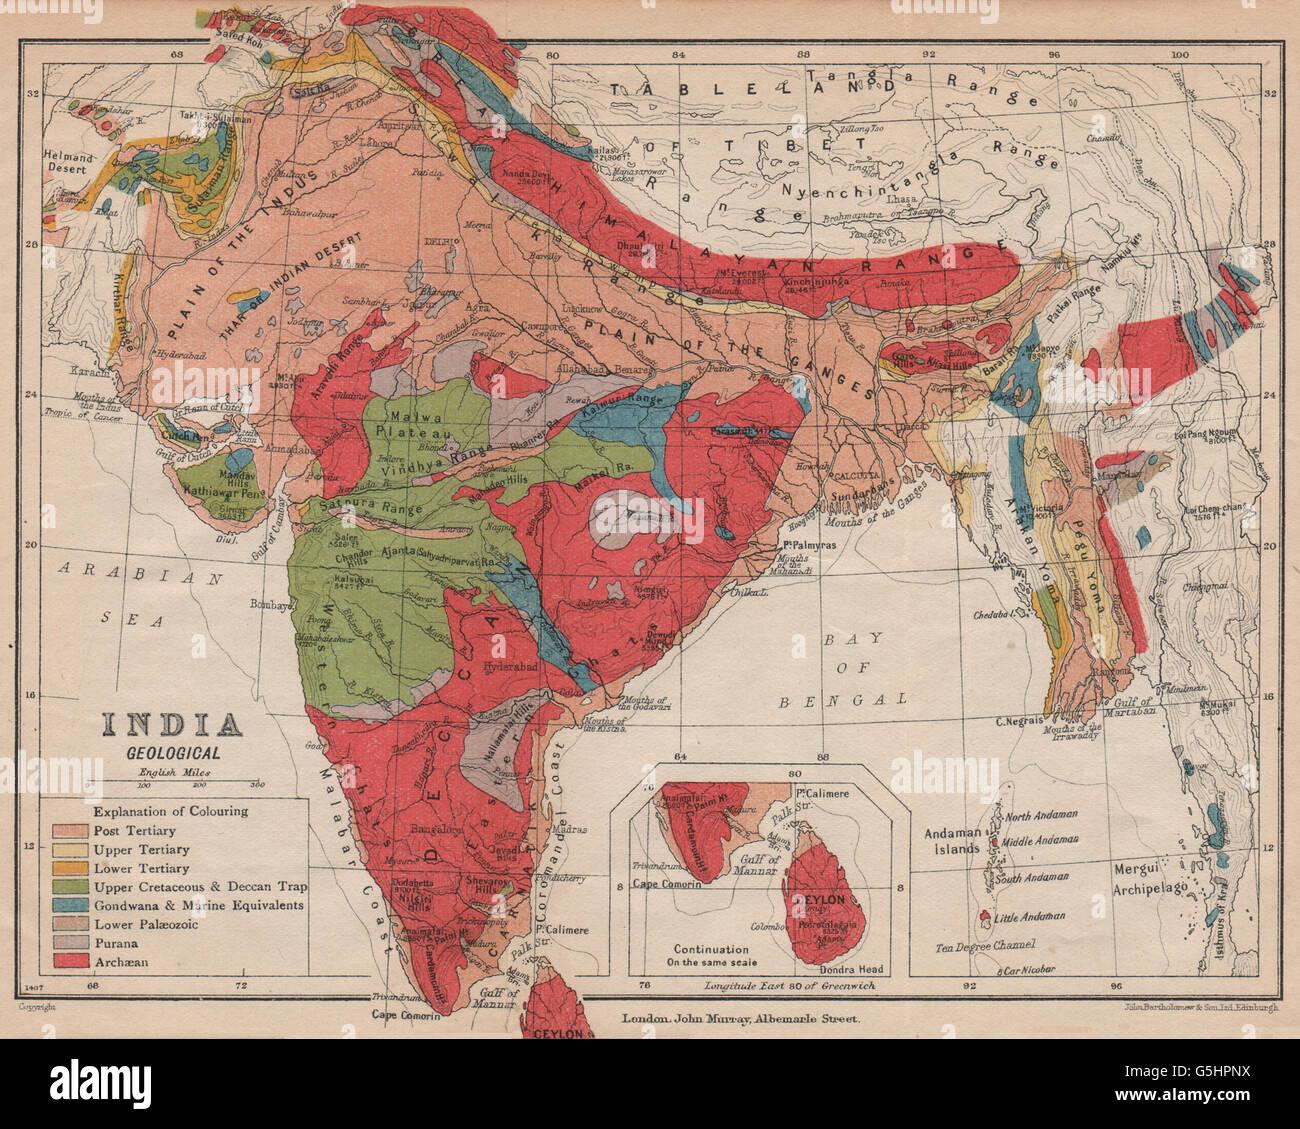 La India. Mapa geológico. Cretáceo terciario Archaean Purana Gondwana, 1929 Imagen De Stock